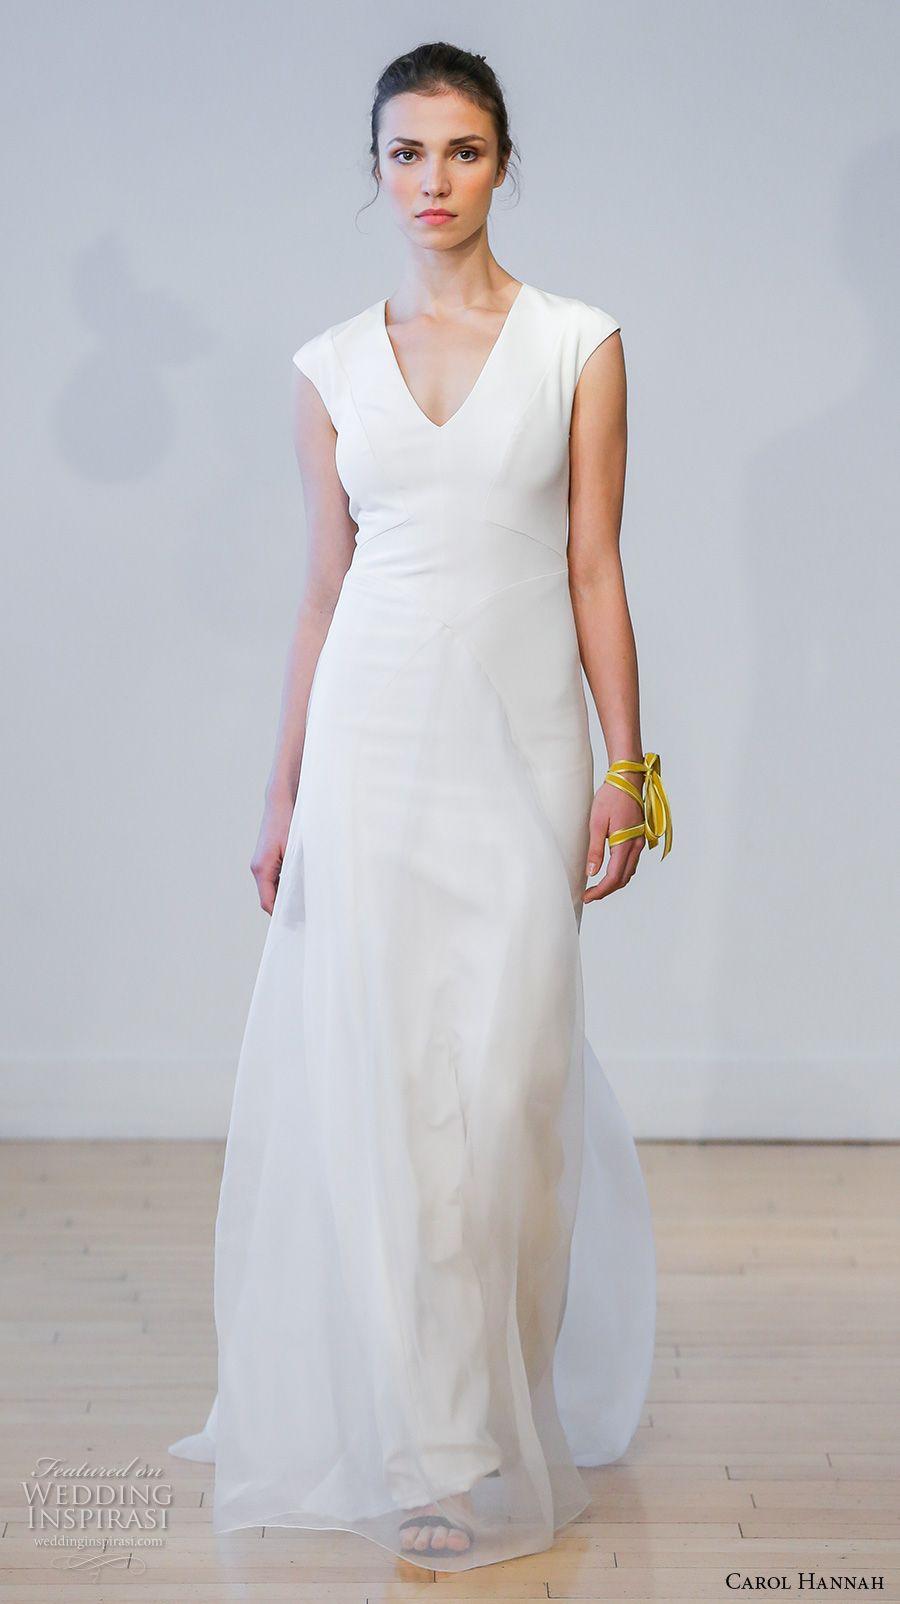 Simple elegant wedding dress designers  Carol Hannah  Wedding Dresses u ucBotanicaud Bridal Collection